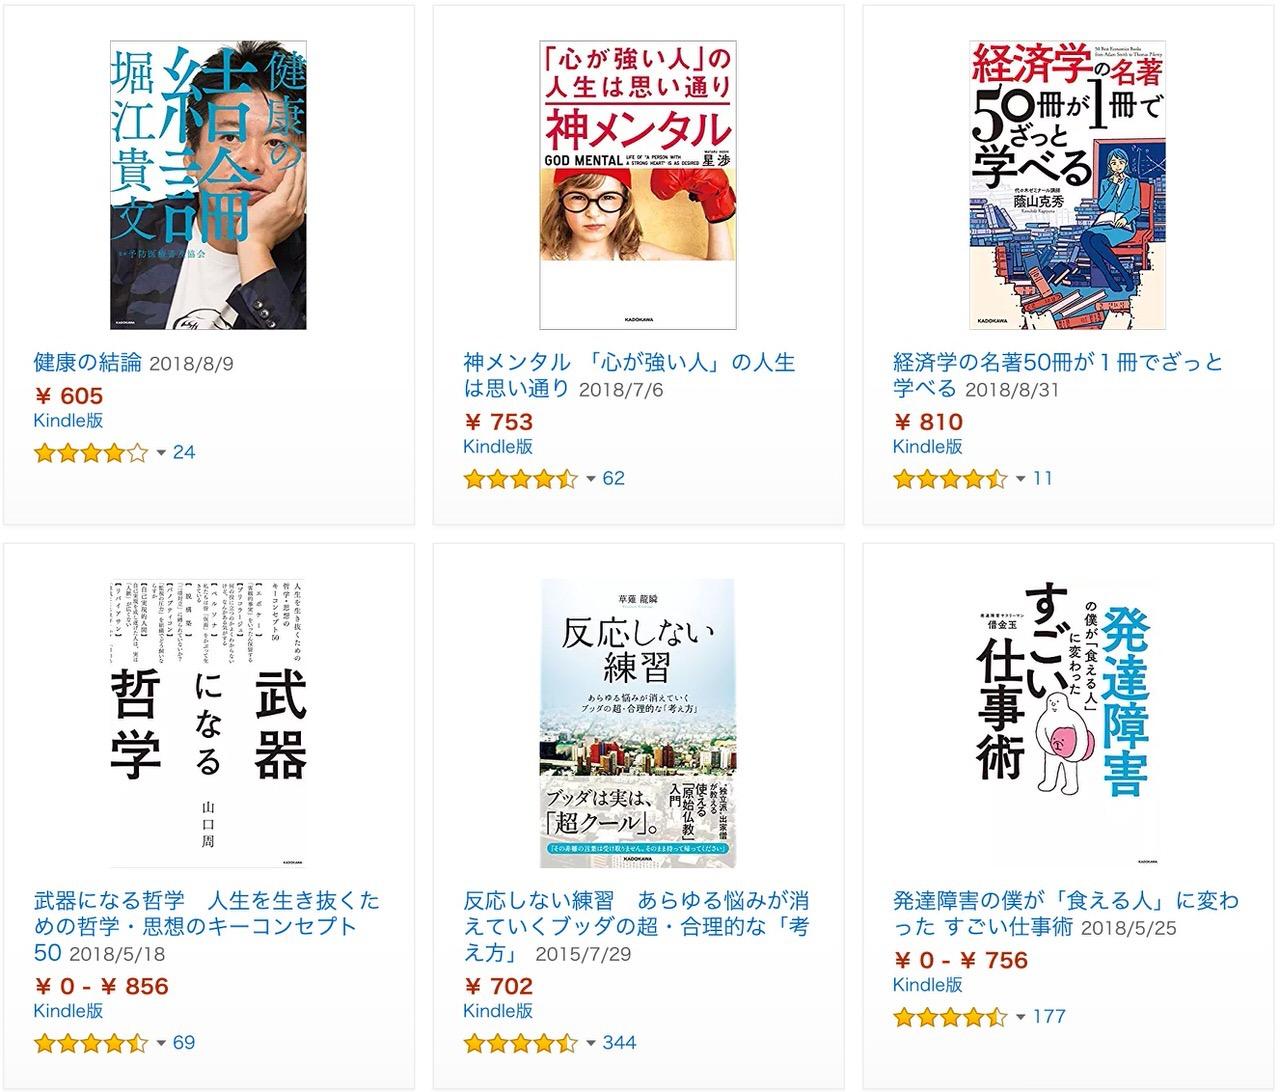 【Kindleセール】KADOKAWA作品7,000冊以上が対象!「50%OFF」Kindle本 新春セール @mehori ライフハック大全も(1/17まで)